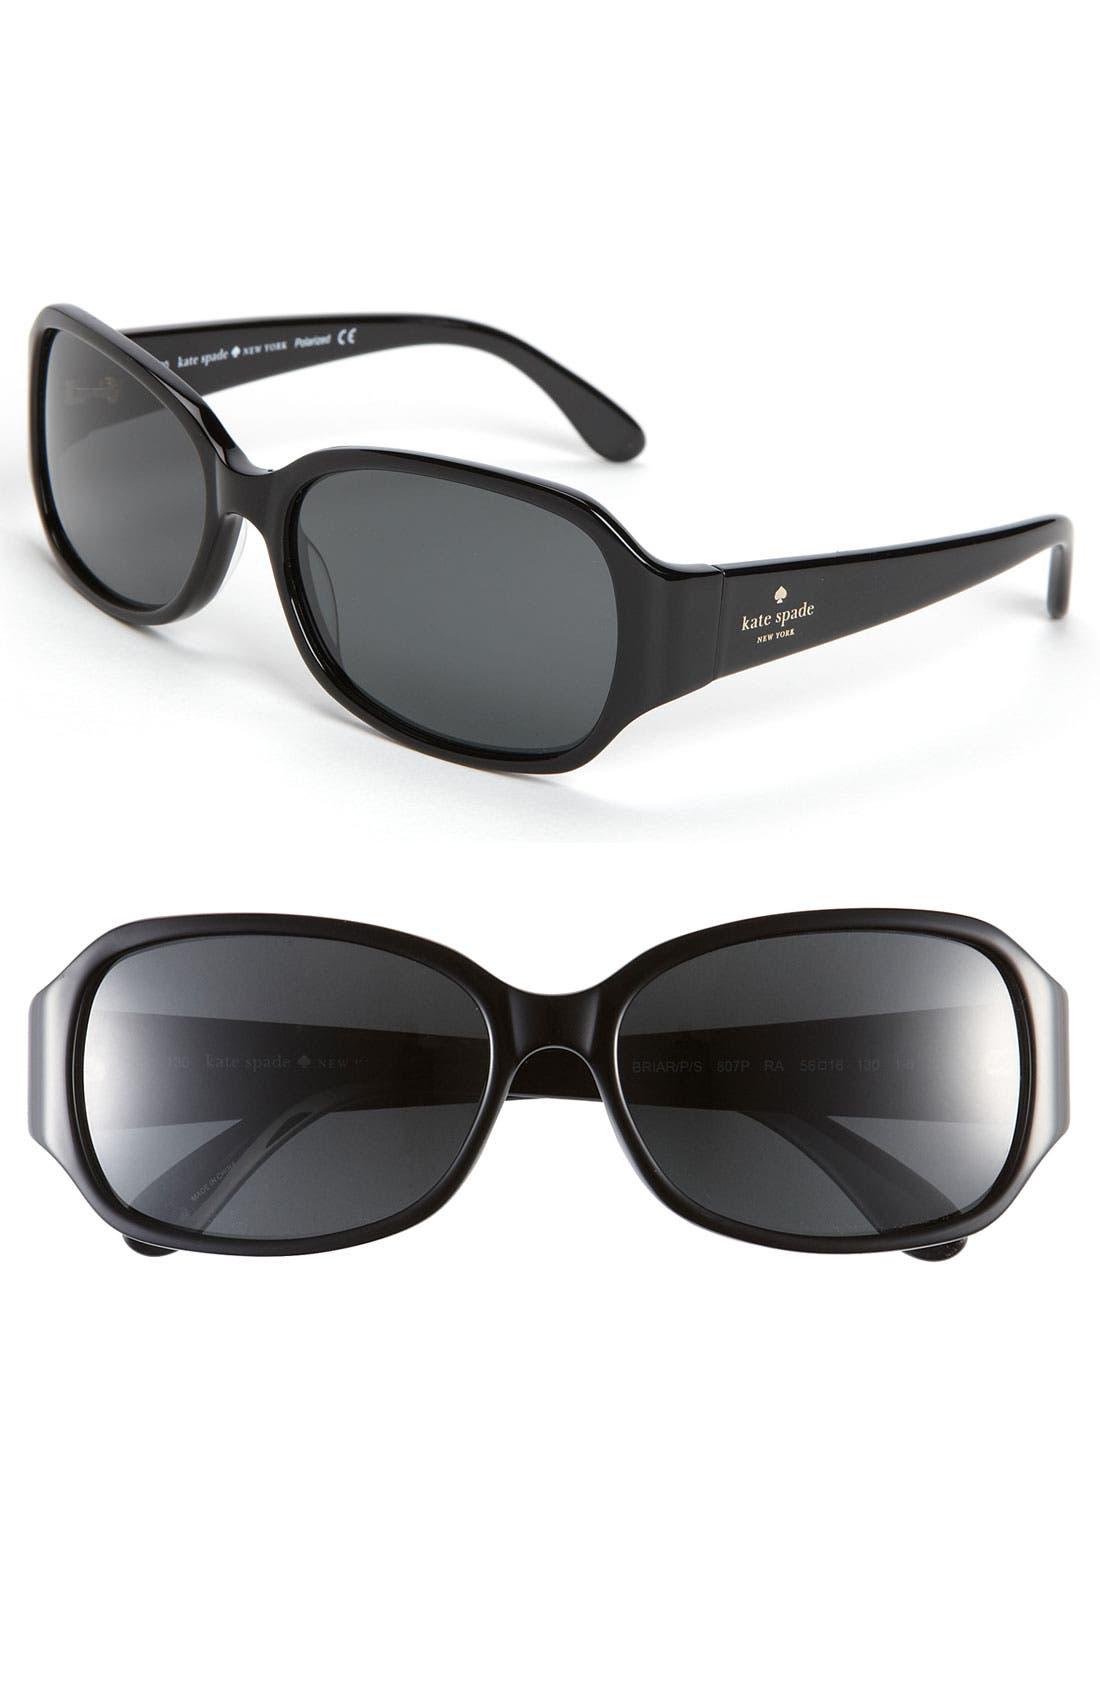 KATE SPADE NEW YORK,                             'briar' 56mm polarized sunglasses,                             Main thumbnail 1, color,                             001